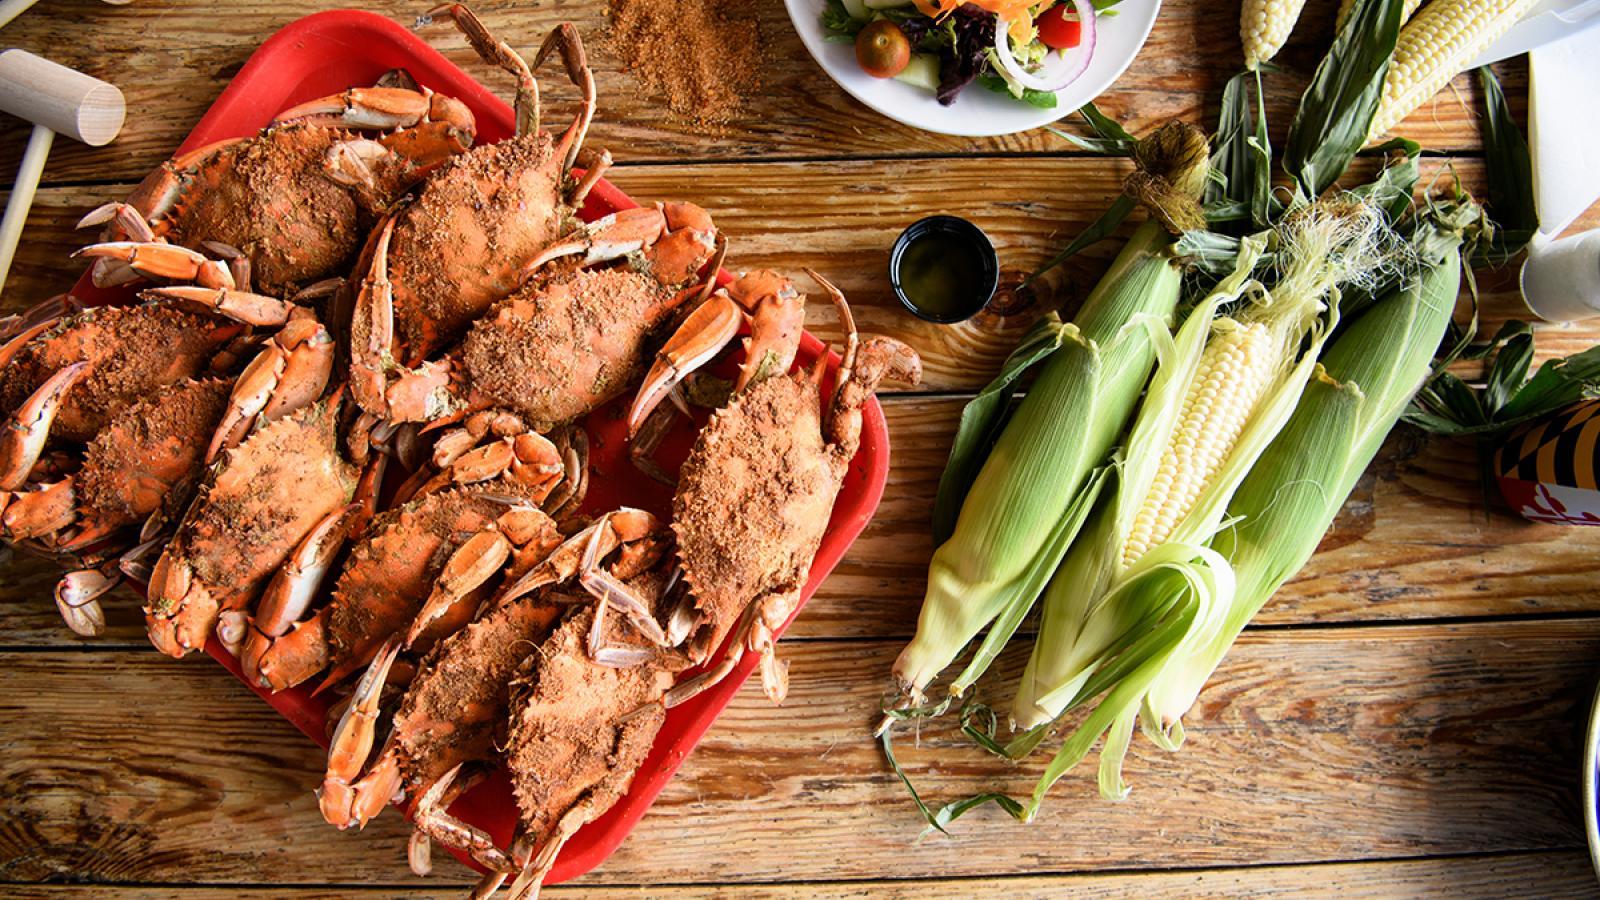 Eastern Shore Crab Restaurants | Maryland Crab & Oyster